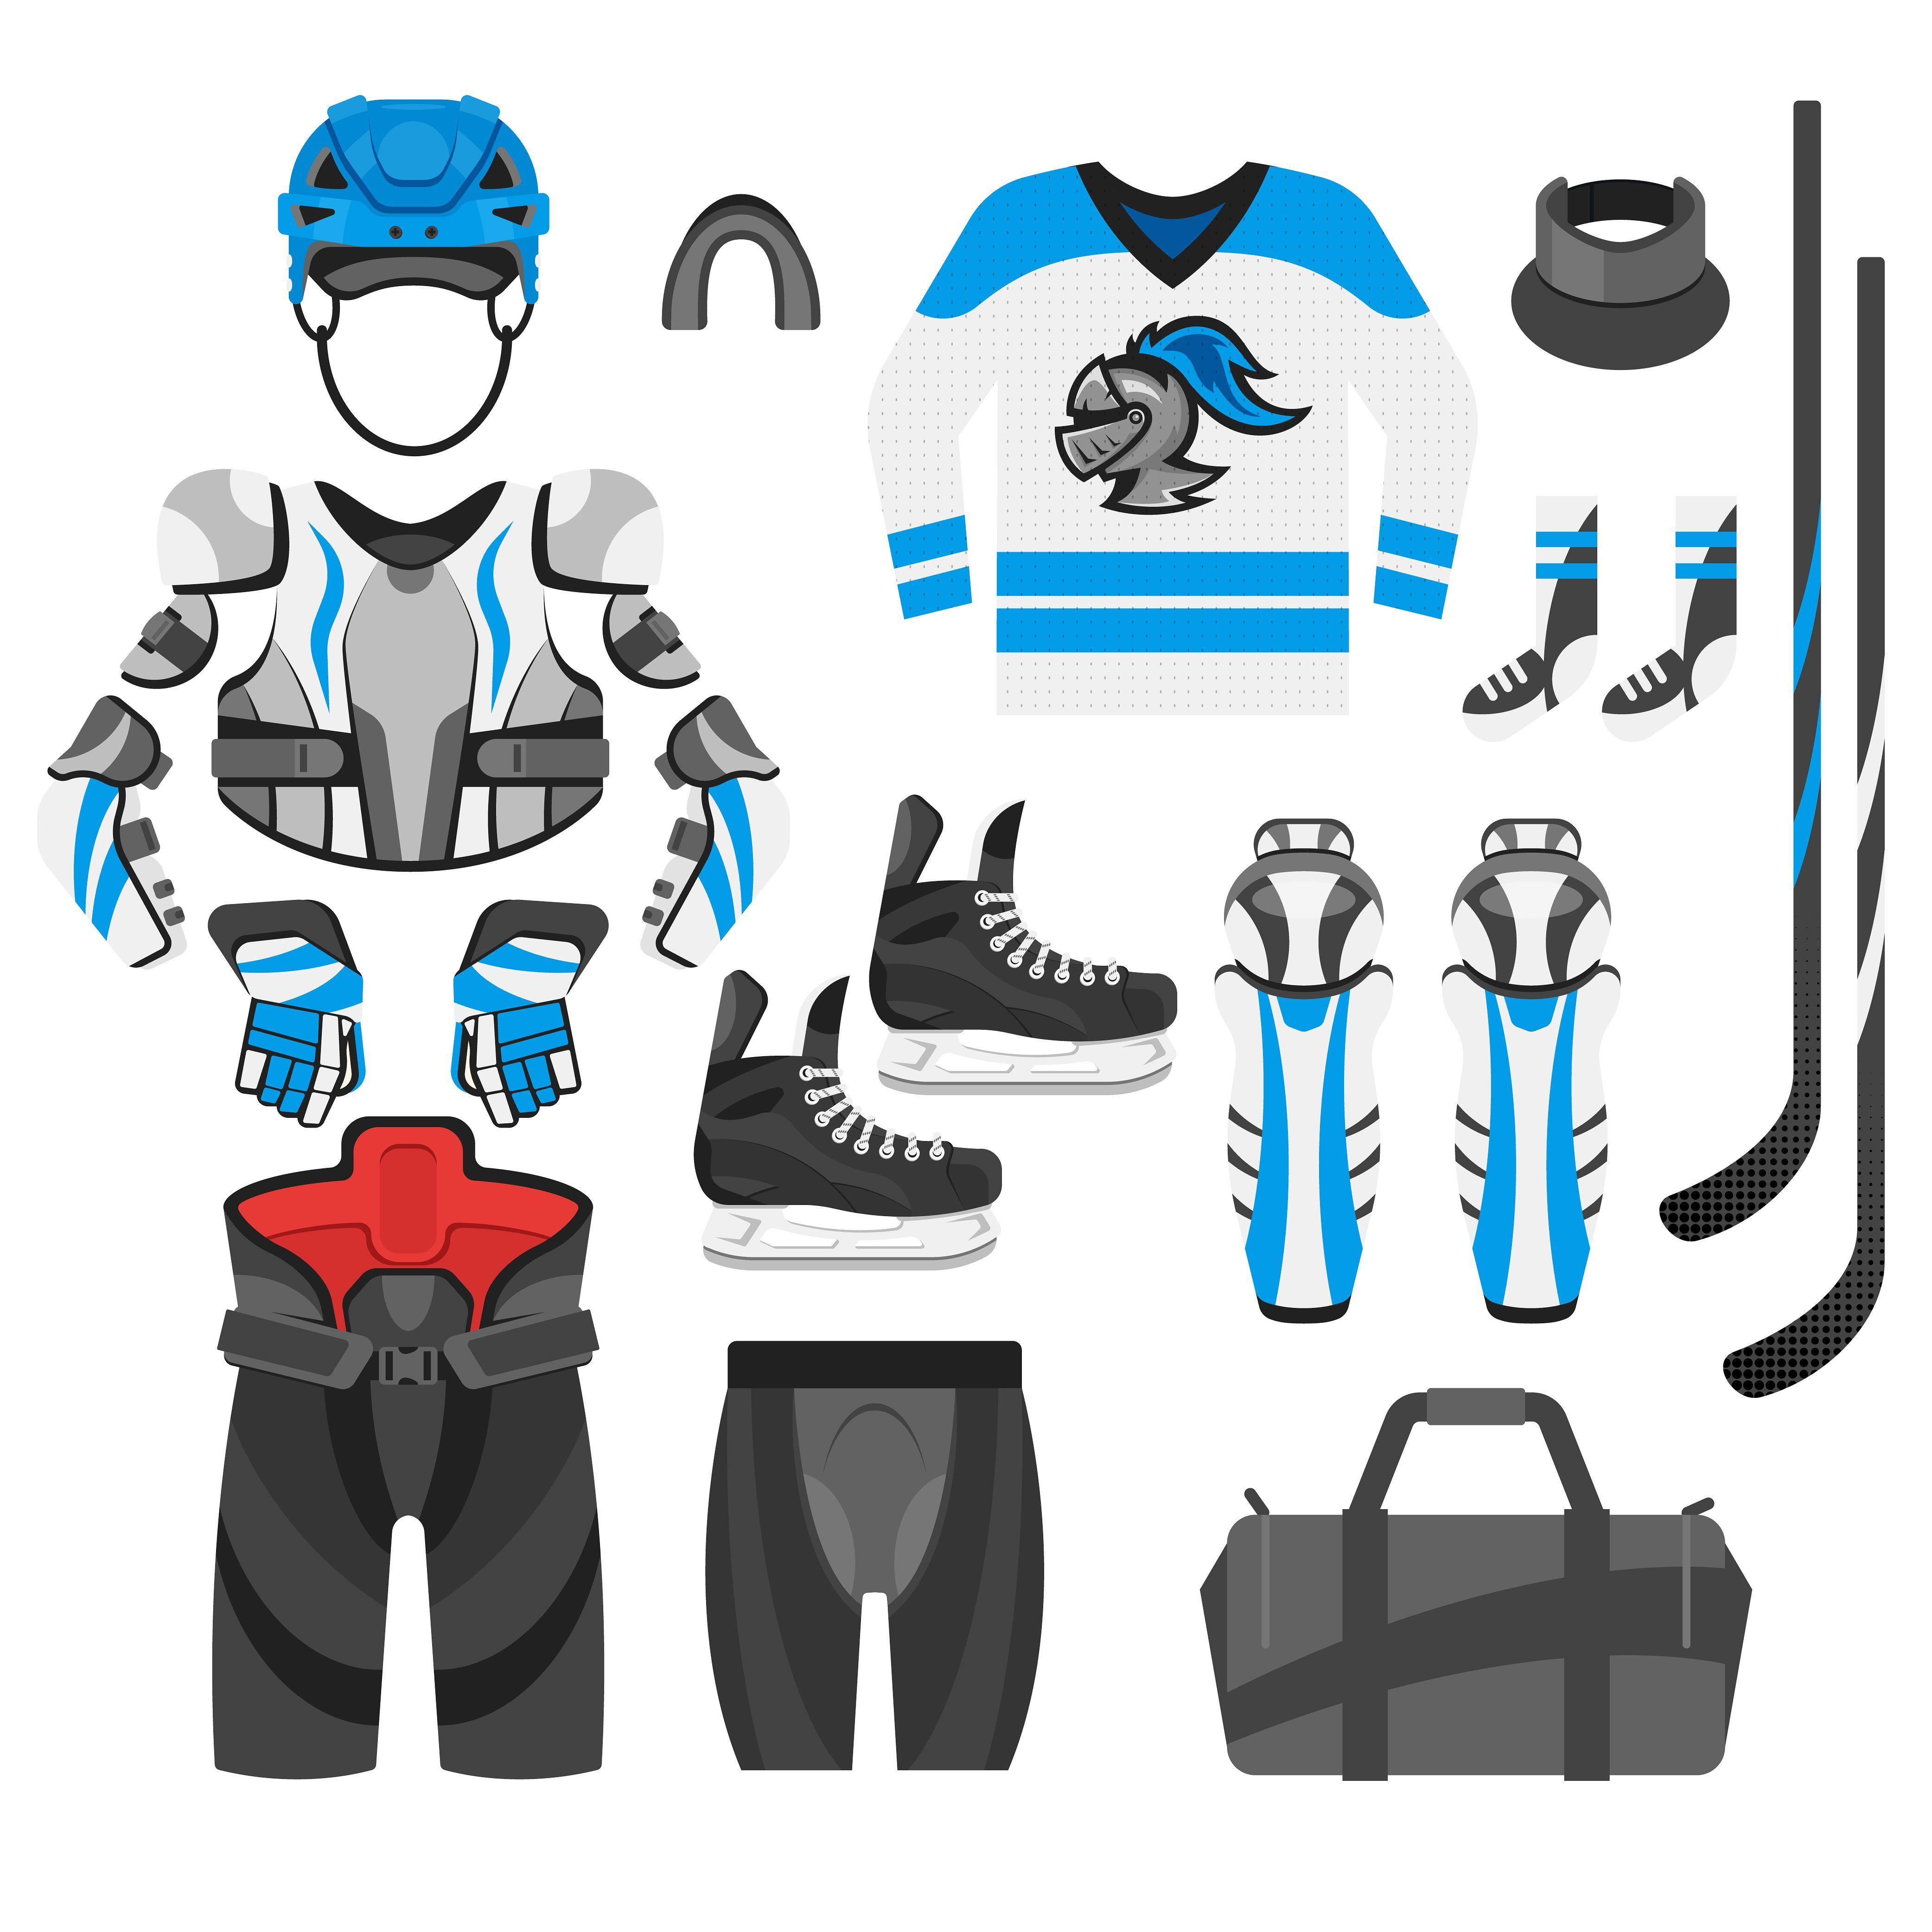 Hockey Equipment Two Colors Hockey Equipment Digital Design Trends Business Illustration